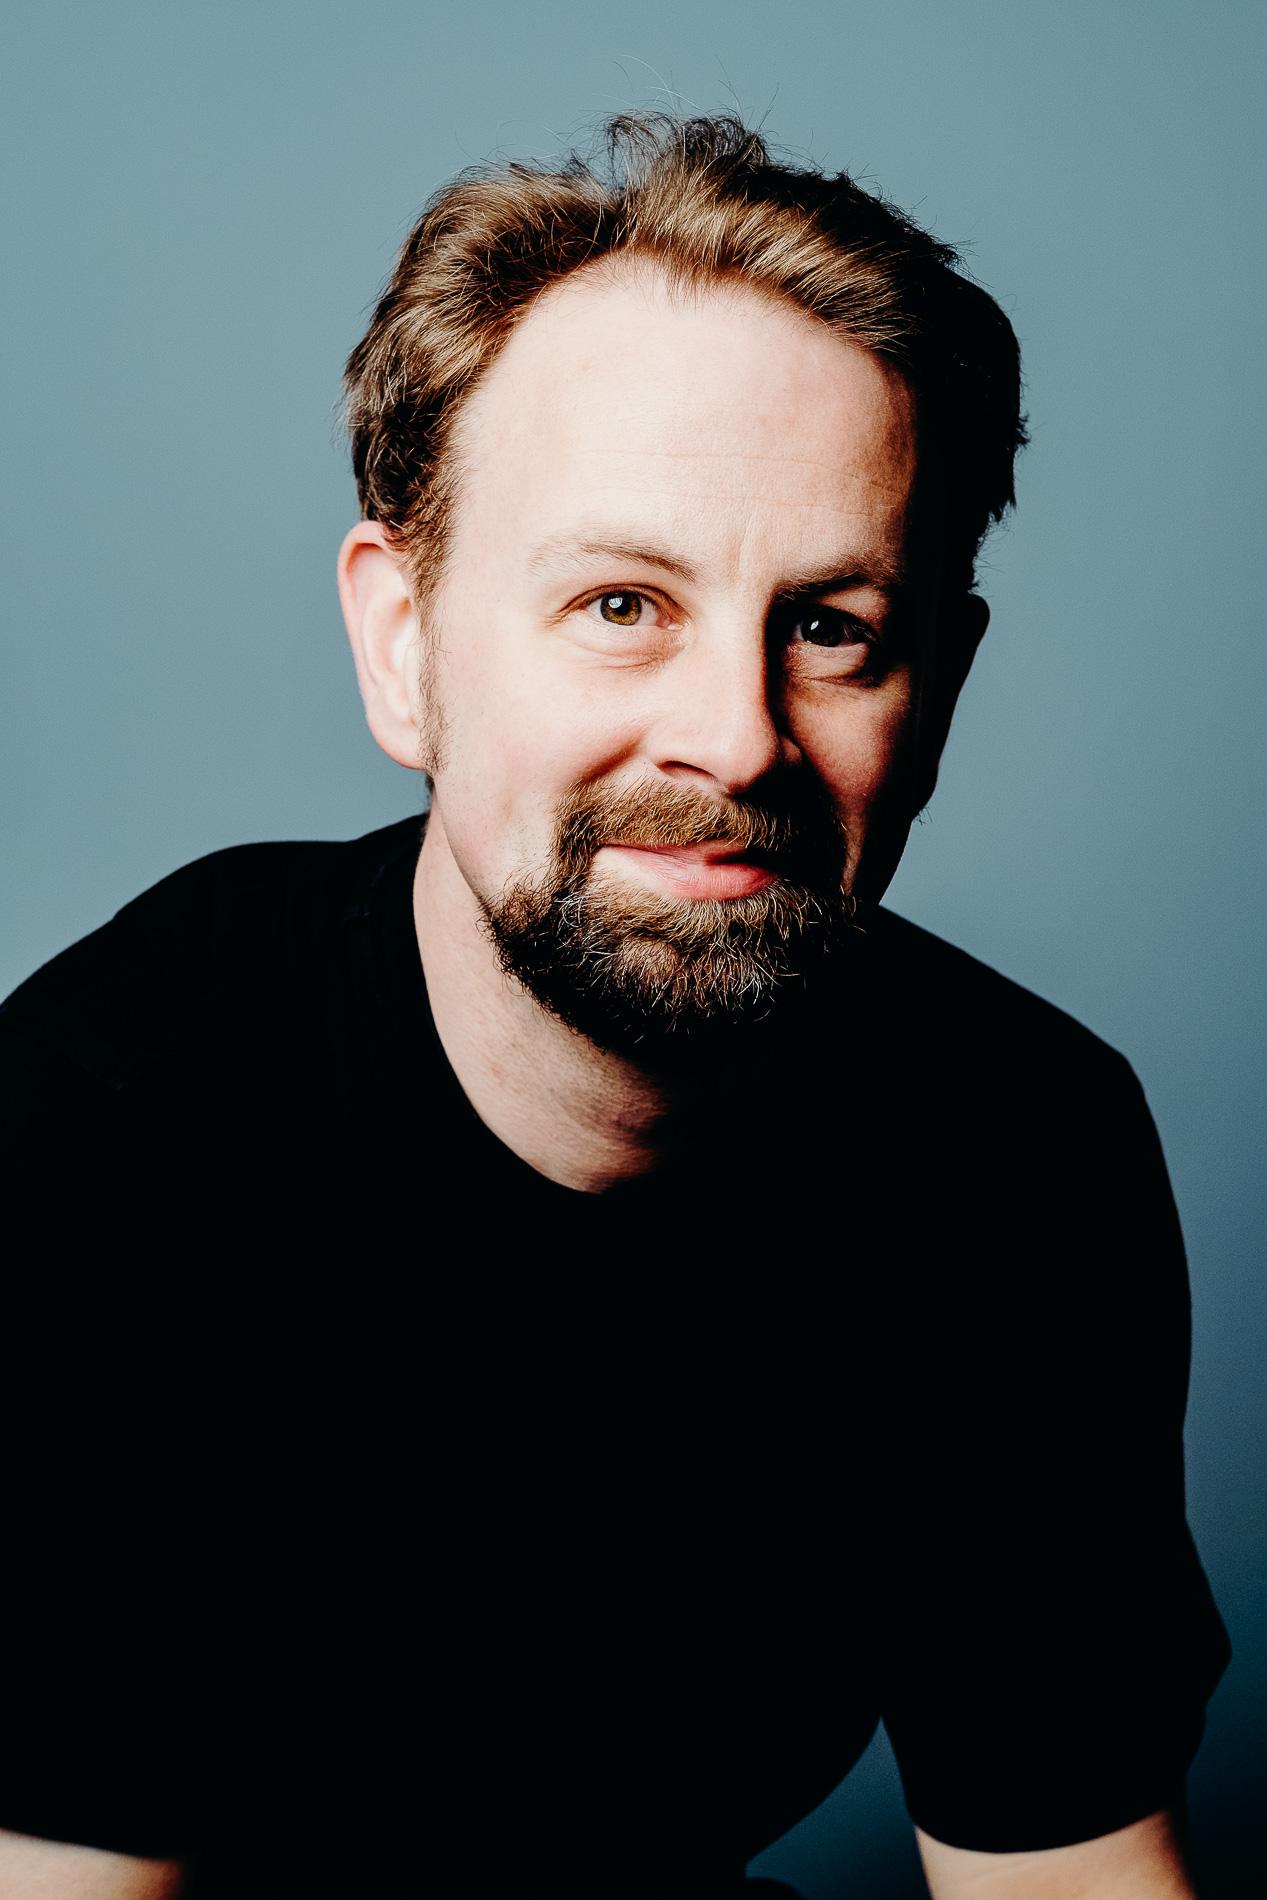 sistart-föhr-mann-portrait-poträt-headshot-fotografin-fotograf